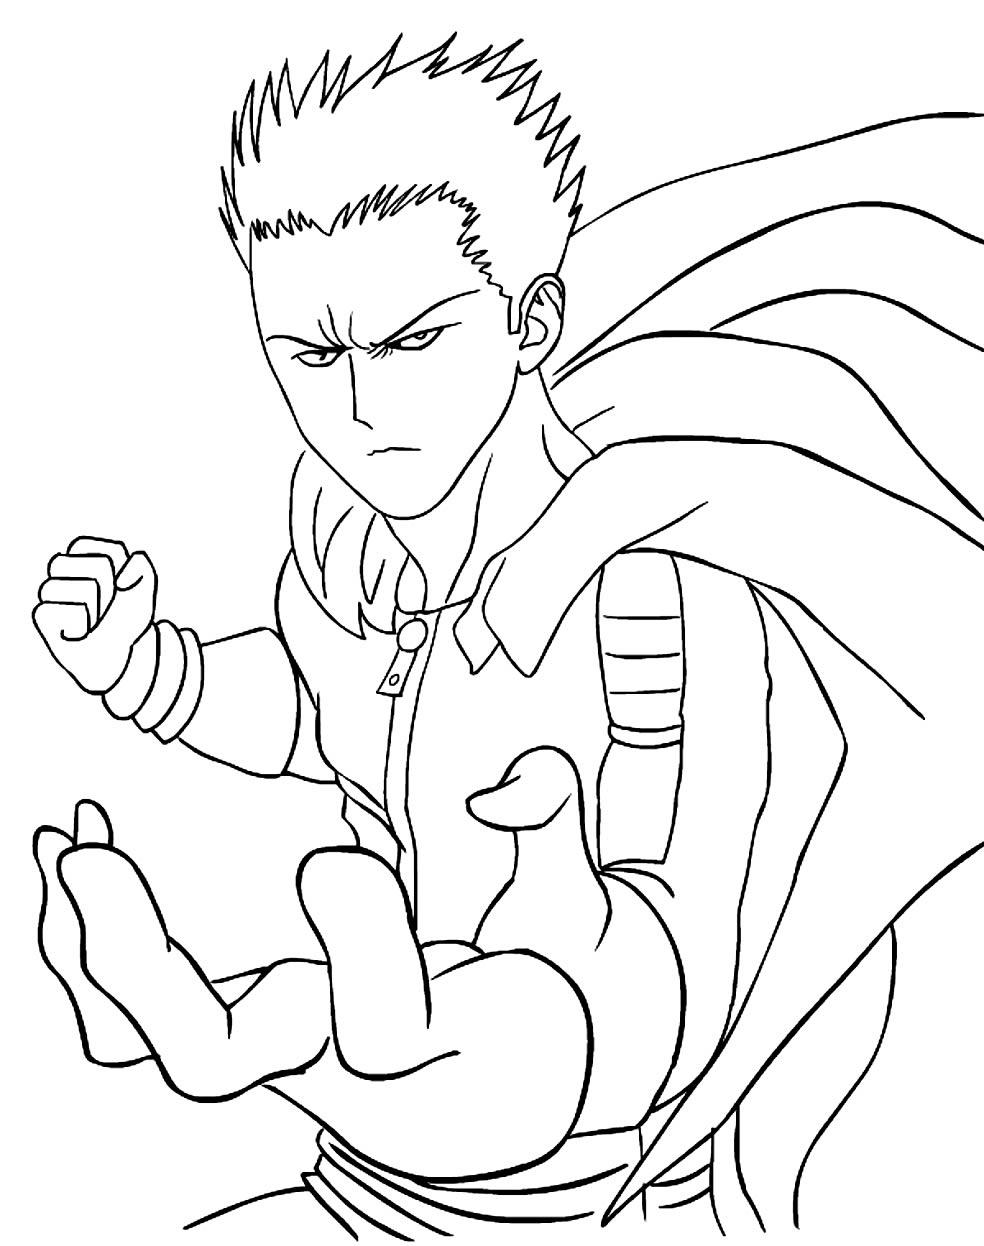 Desenho One Punch-Man para colorir